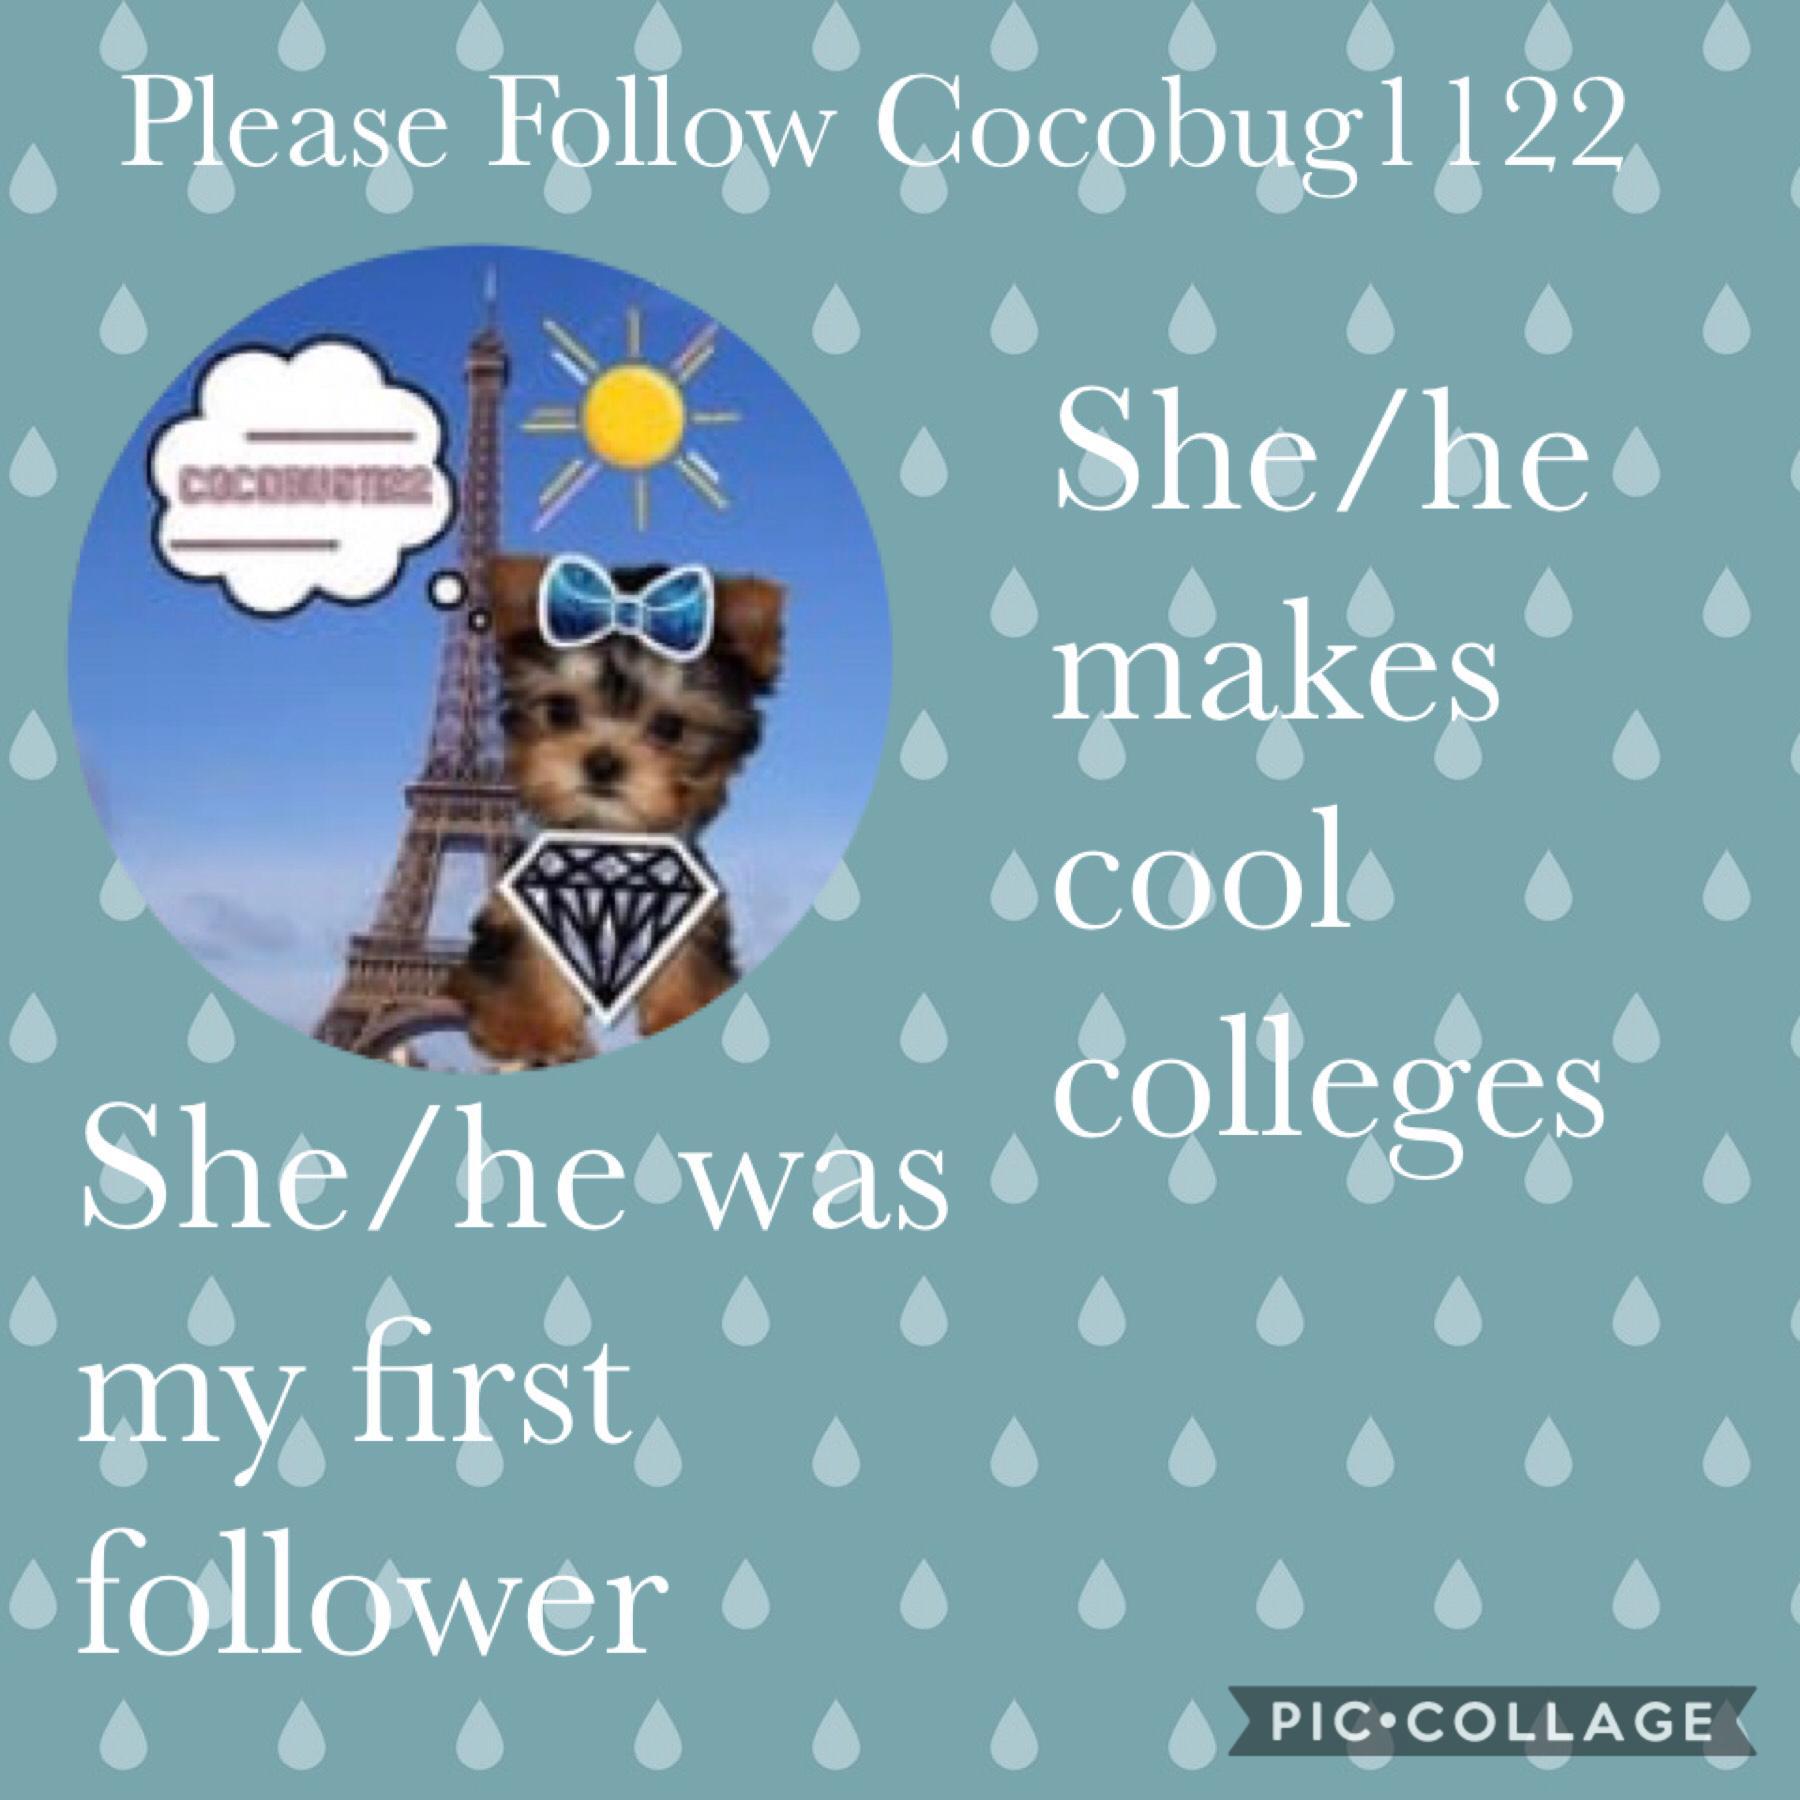 Please follow Cocobug1122